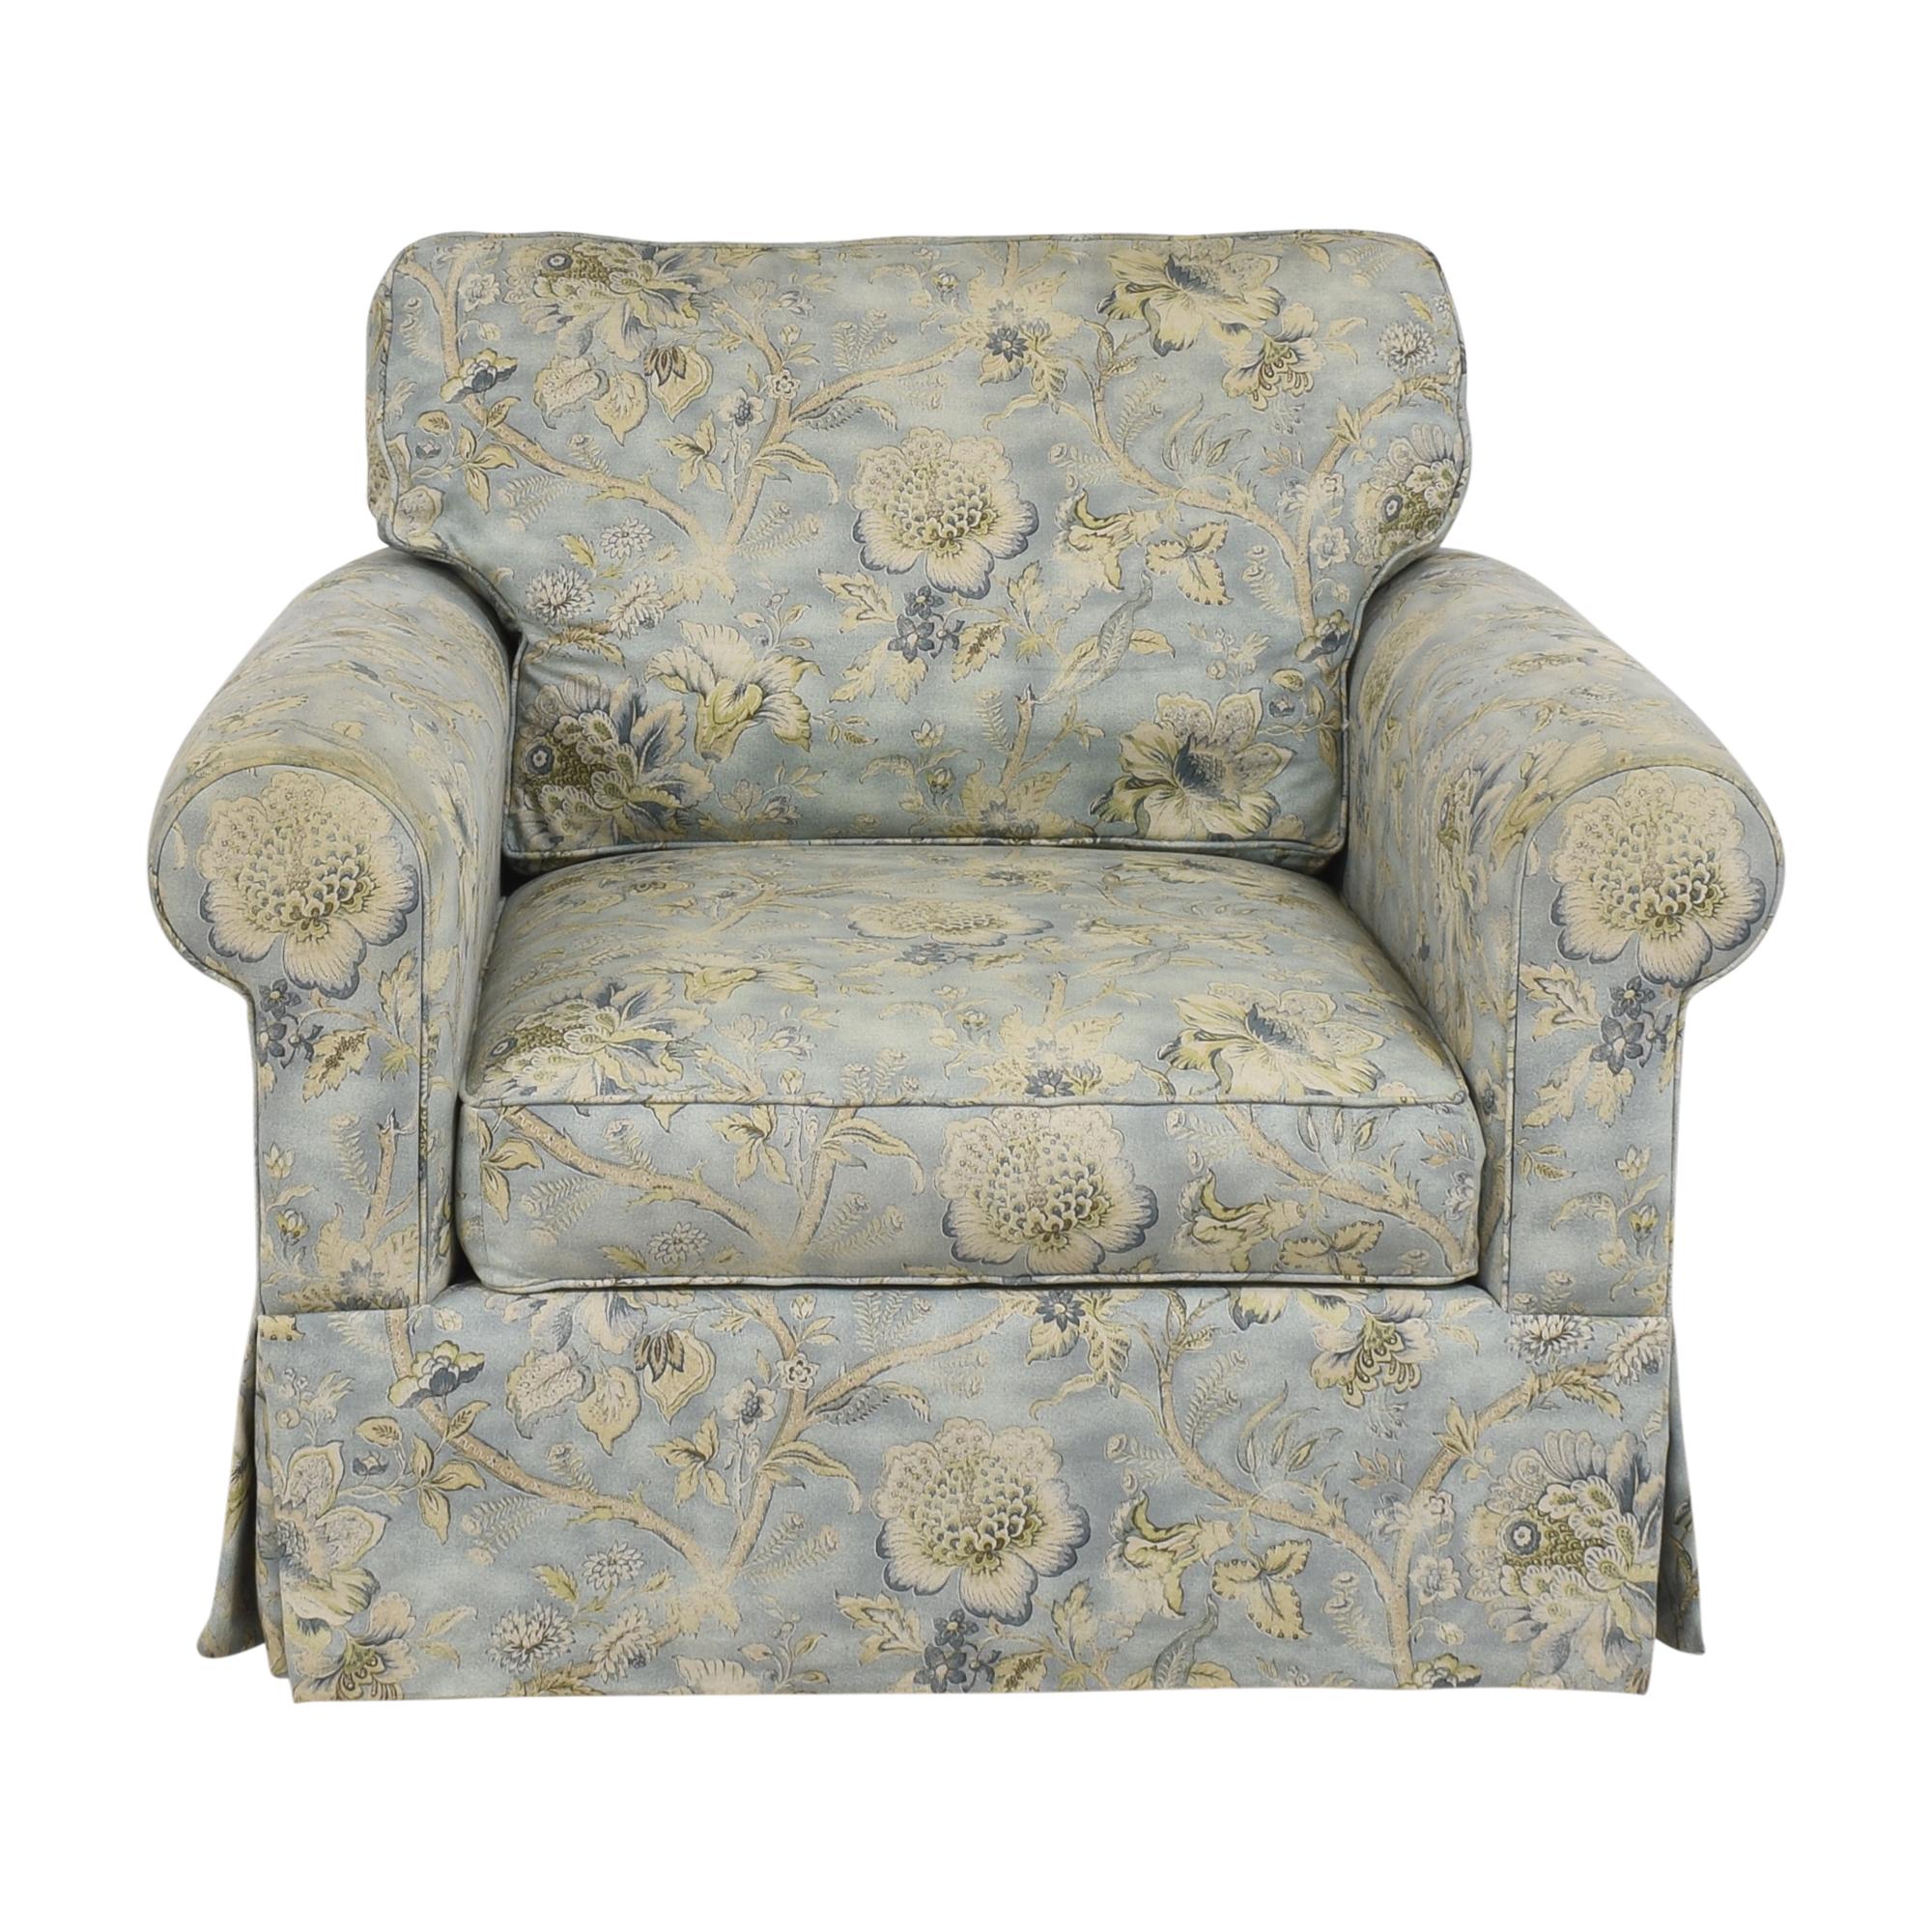 Arhaus Arhaus Baldwin Upholstered Swivel Chair with Ottoman used